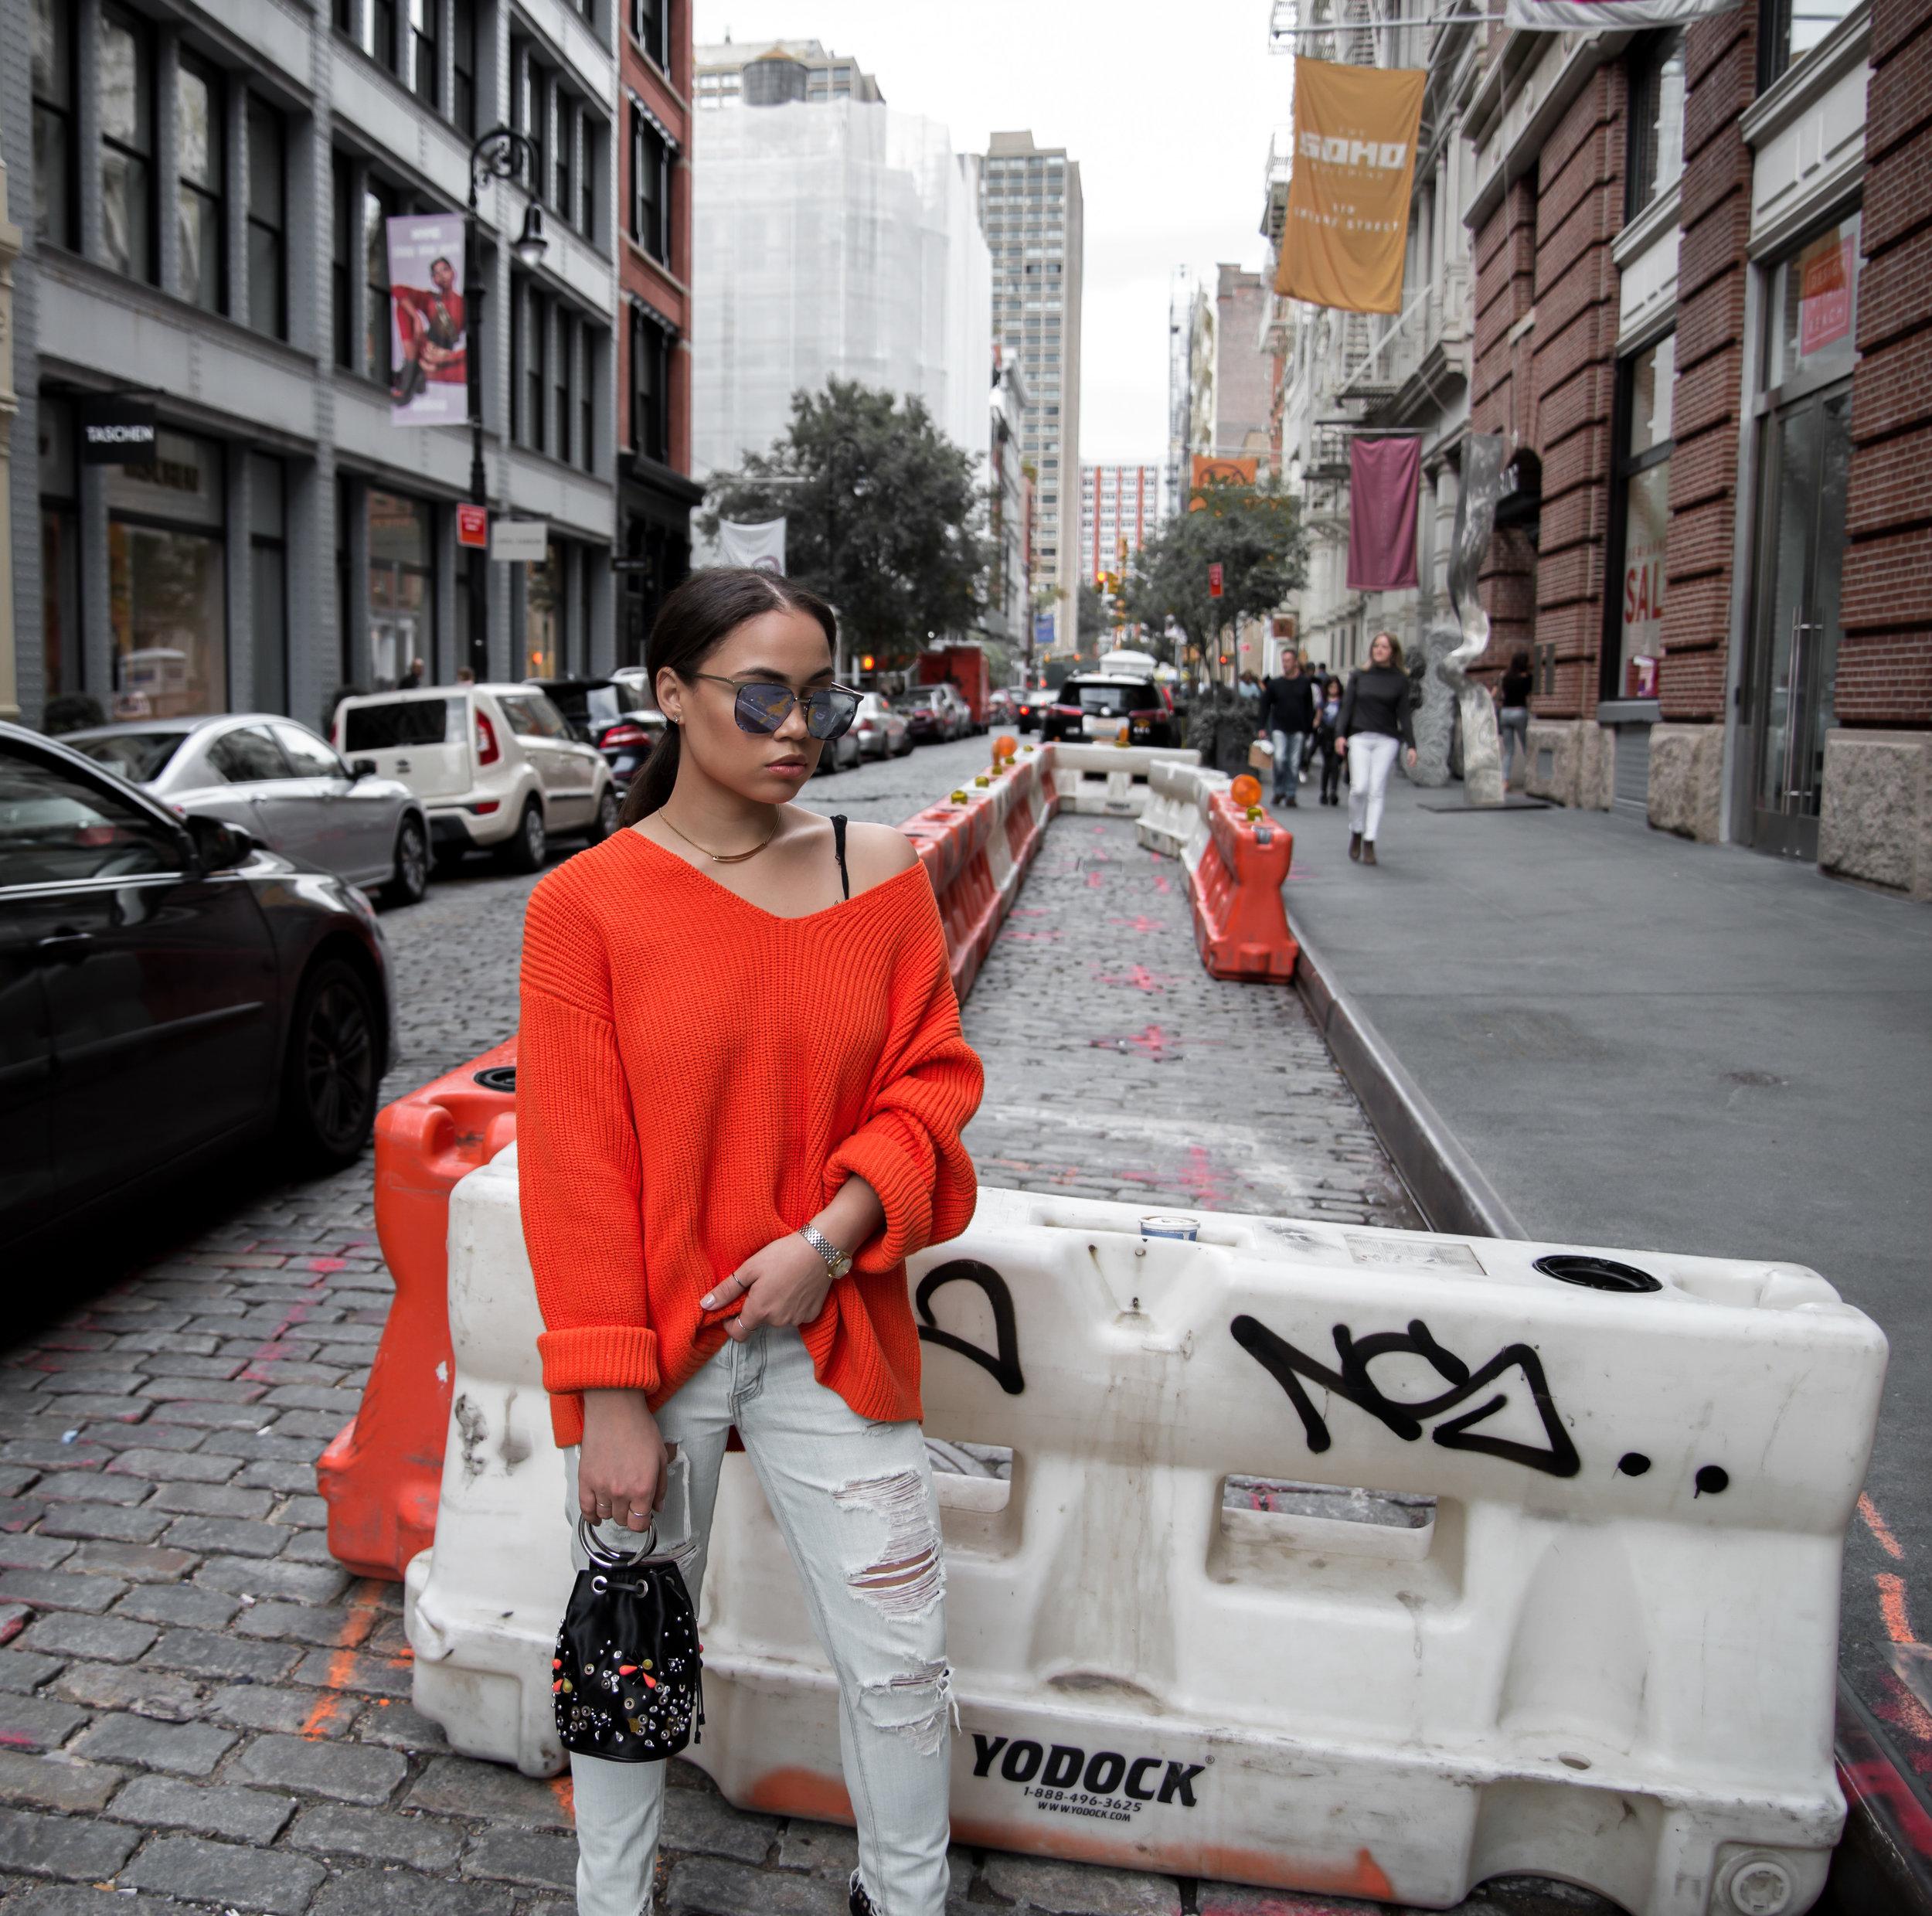 ORANGE H&M SWEATER ZARA MINI BAG EMBELLISHED SCHUTZ SHOES CASUAL STREET STYLE